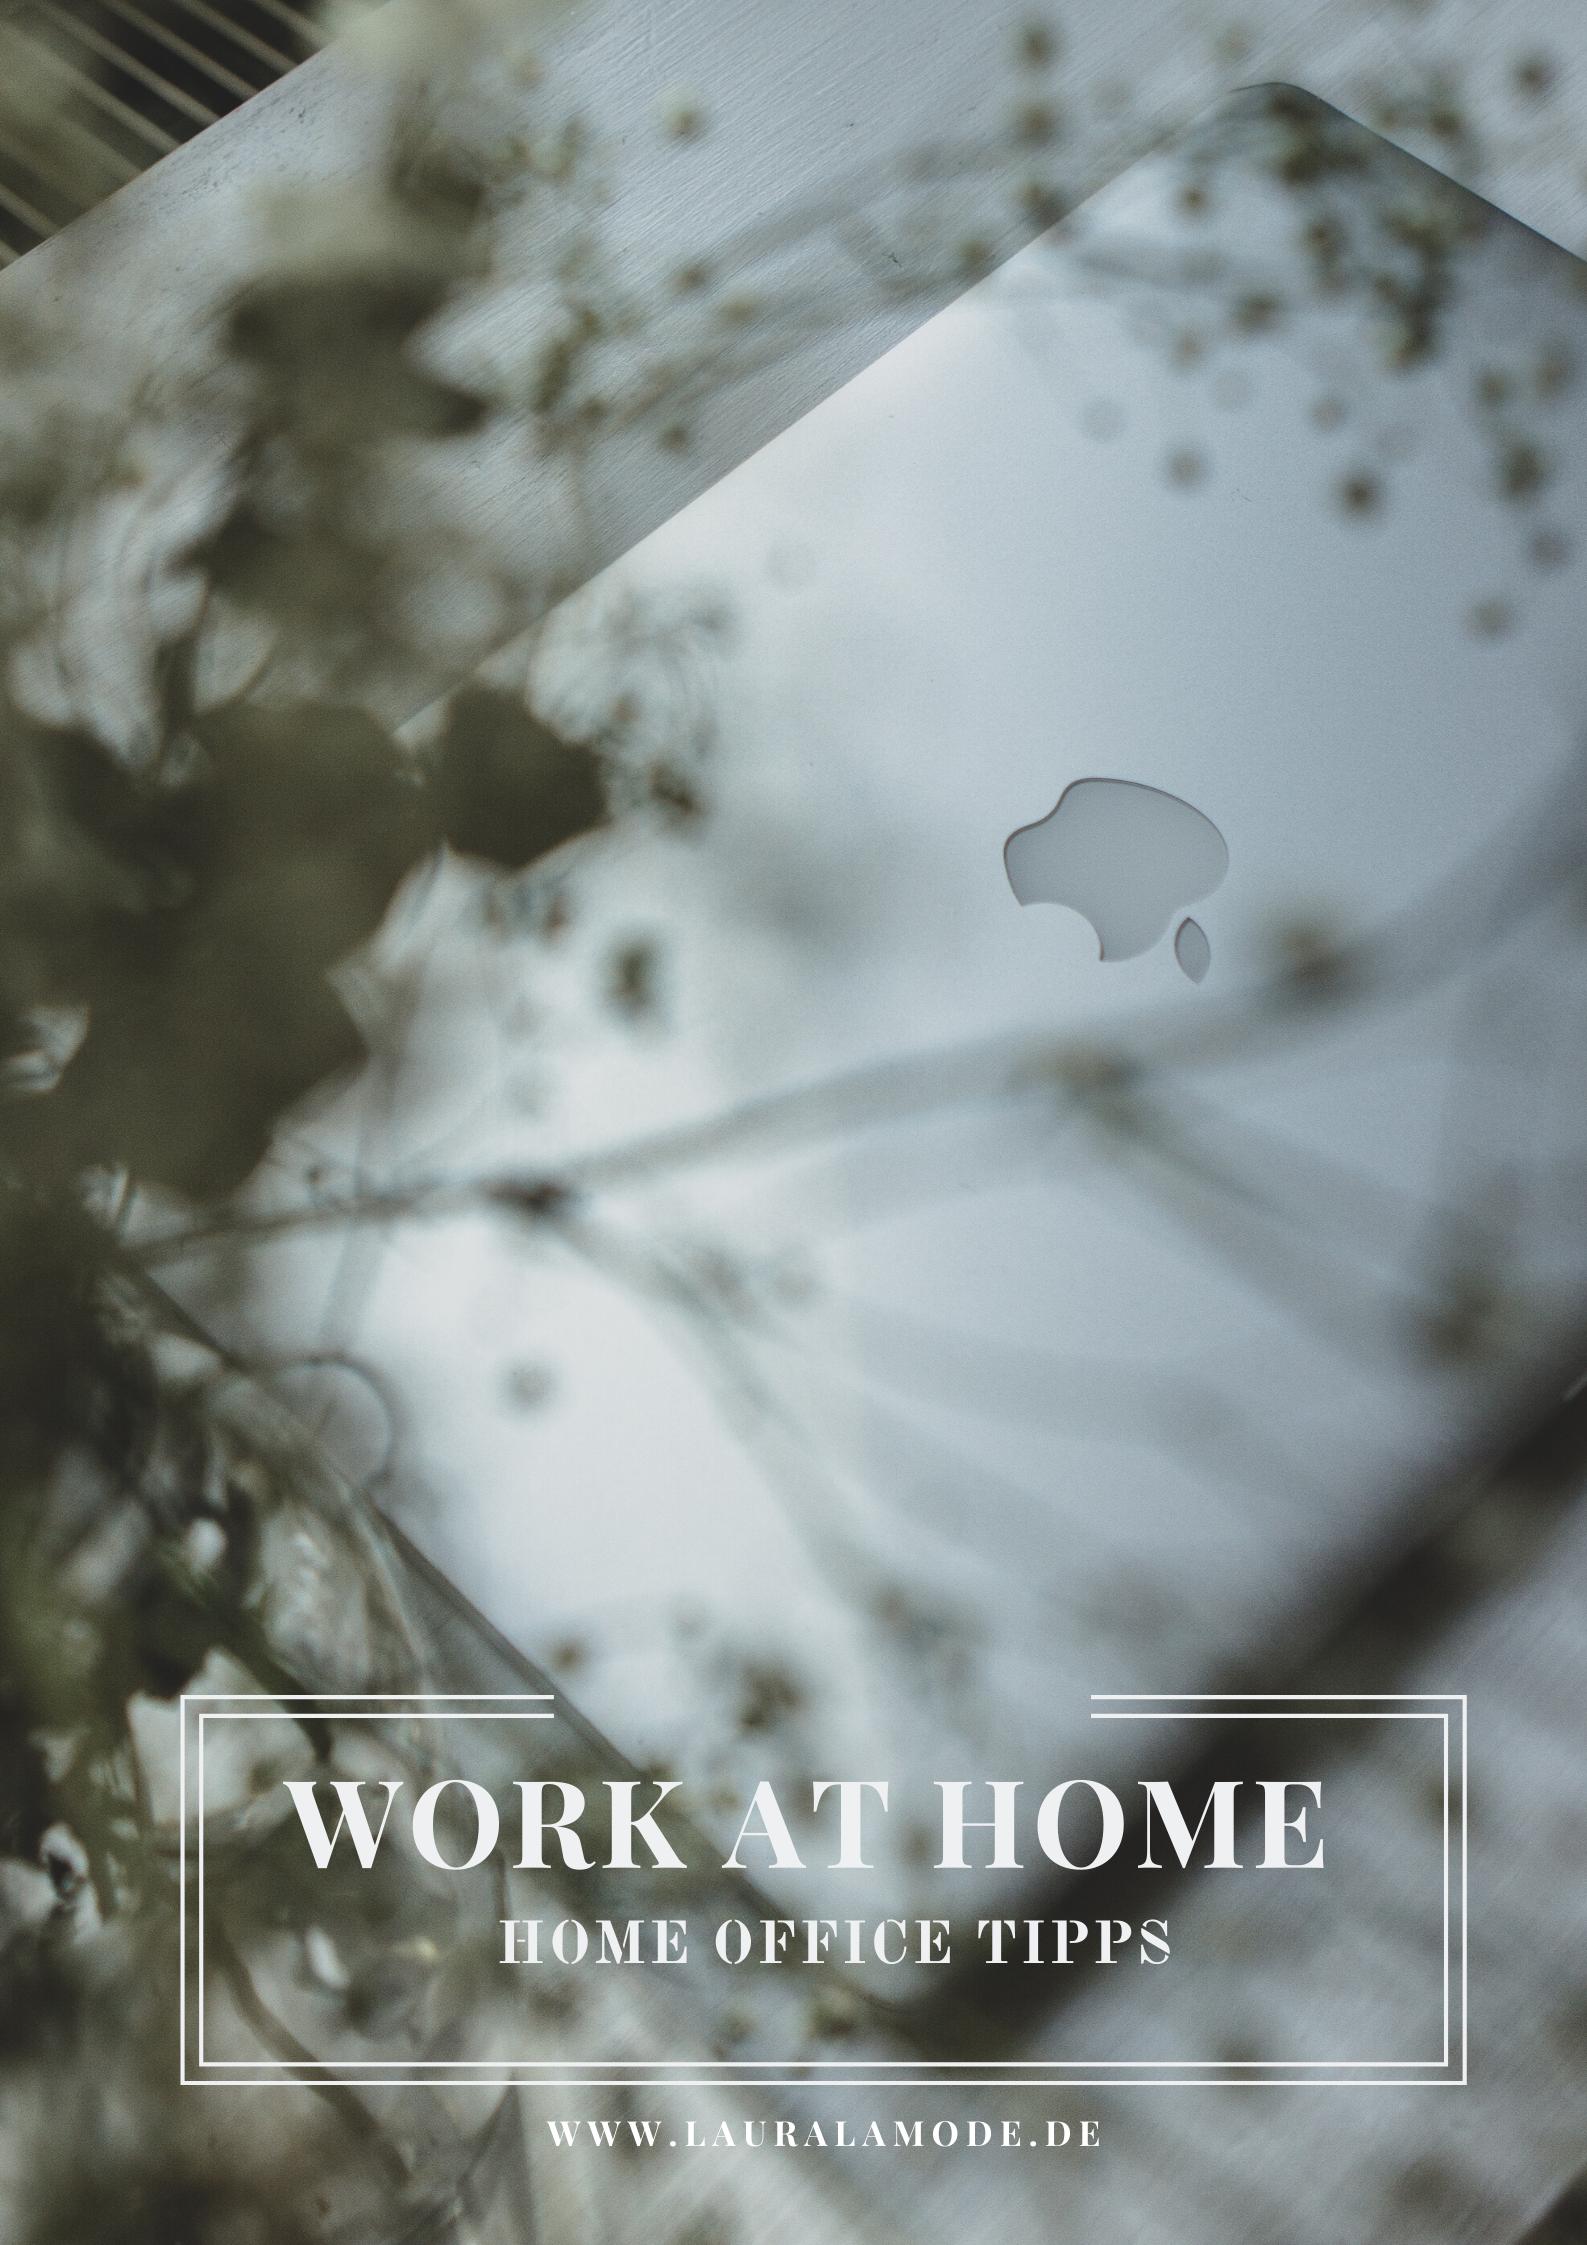 Lauralamode Home Office Office Heimarbeit Home Office Tipps Lifestyleblogger Blogger Lifestyle Effektivität Produktivität Im Home Office